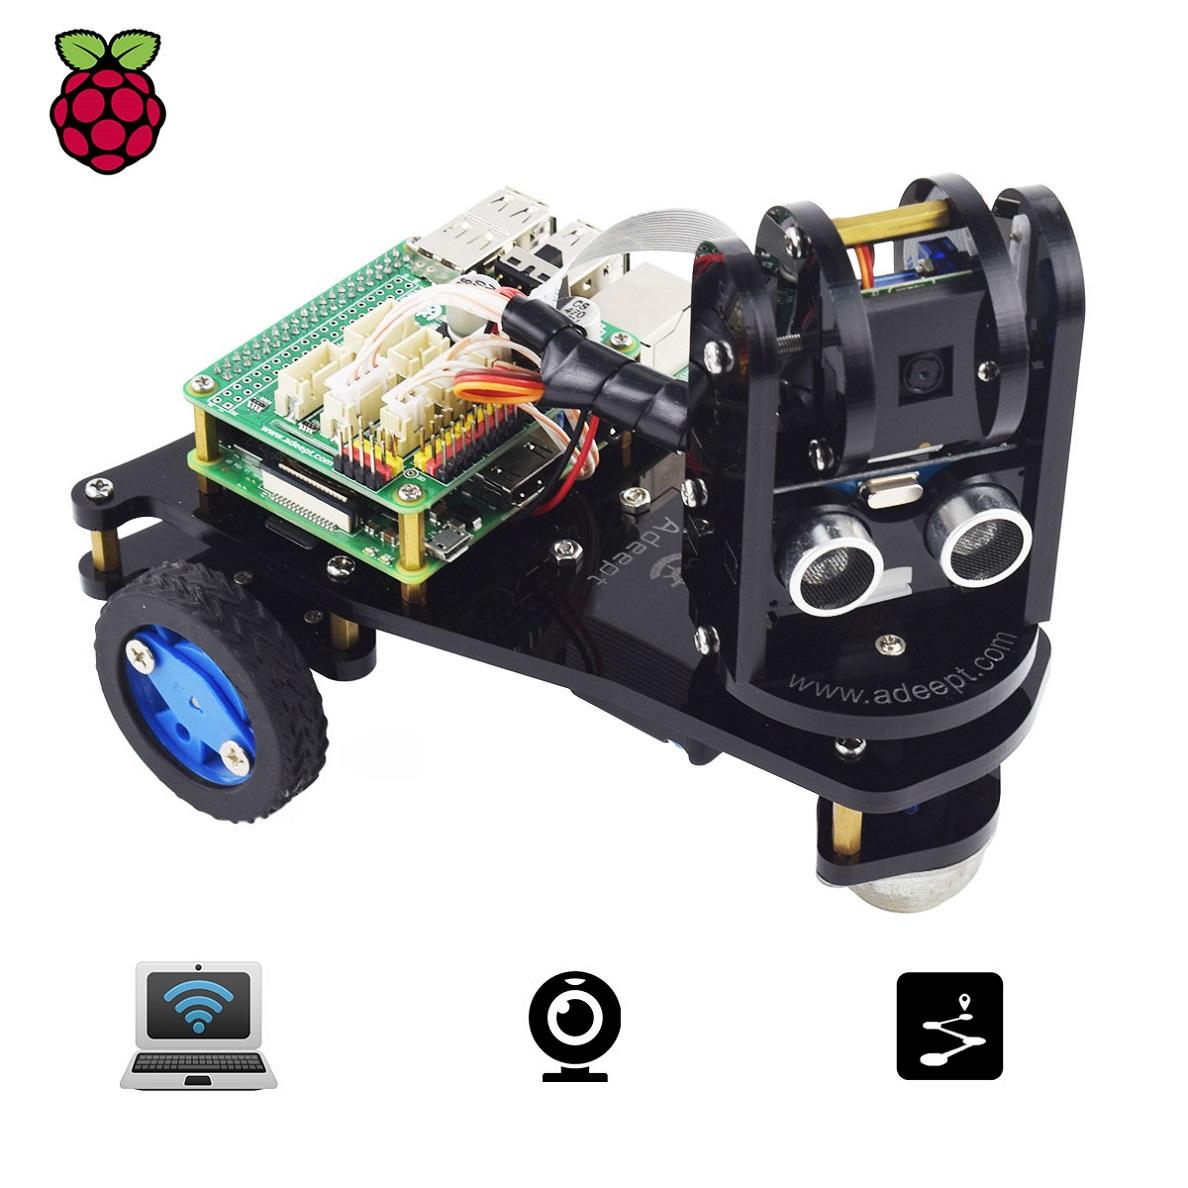 Adeept PiCar-A WiFi 3WD Smart Robot Car Kit for Raspberry Pi